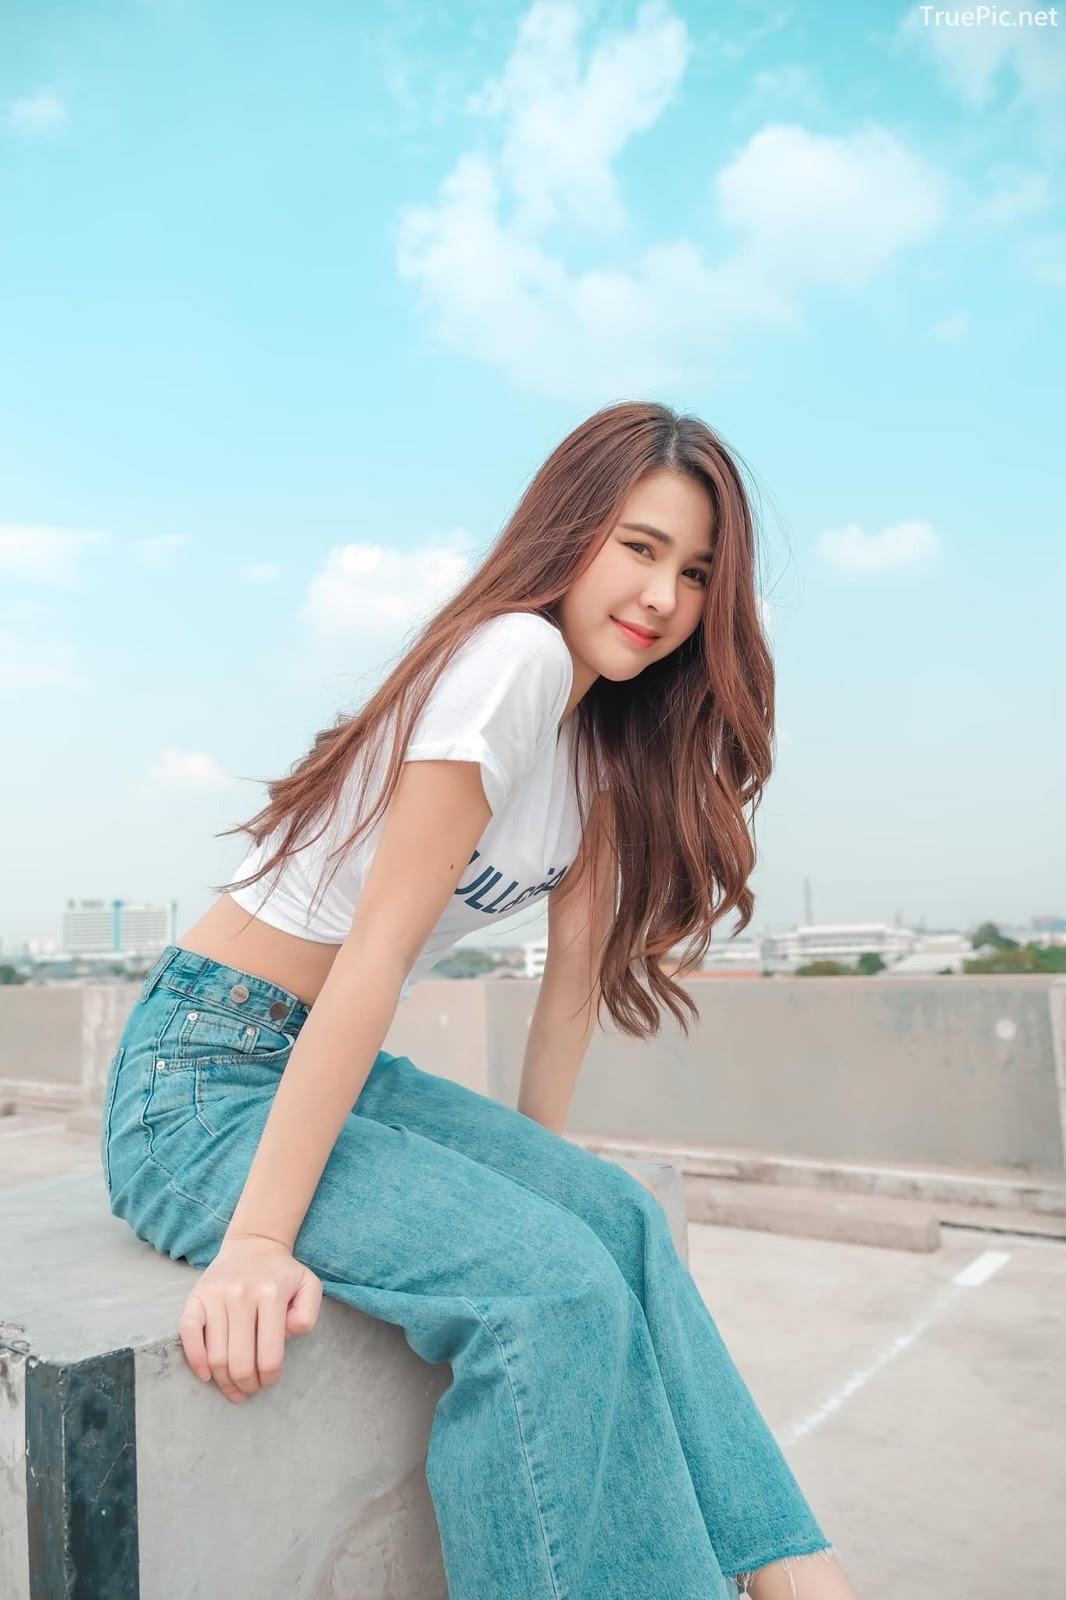 Thailan cute model - Supansa Yoopradit (Lorpor) - The terrace is full of windy afternoon - Picture 6